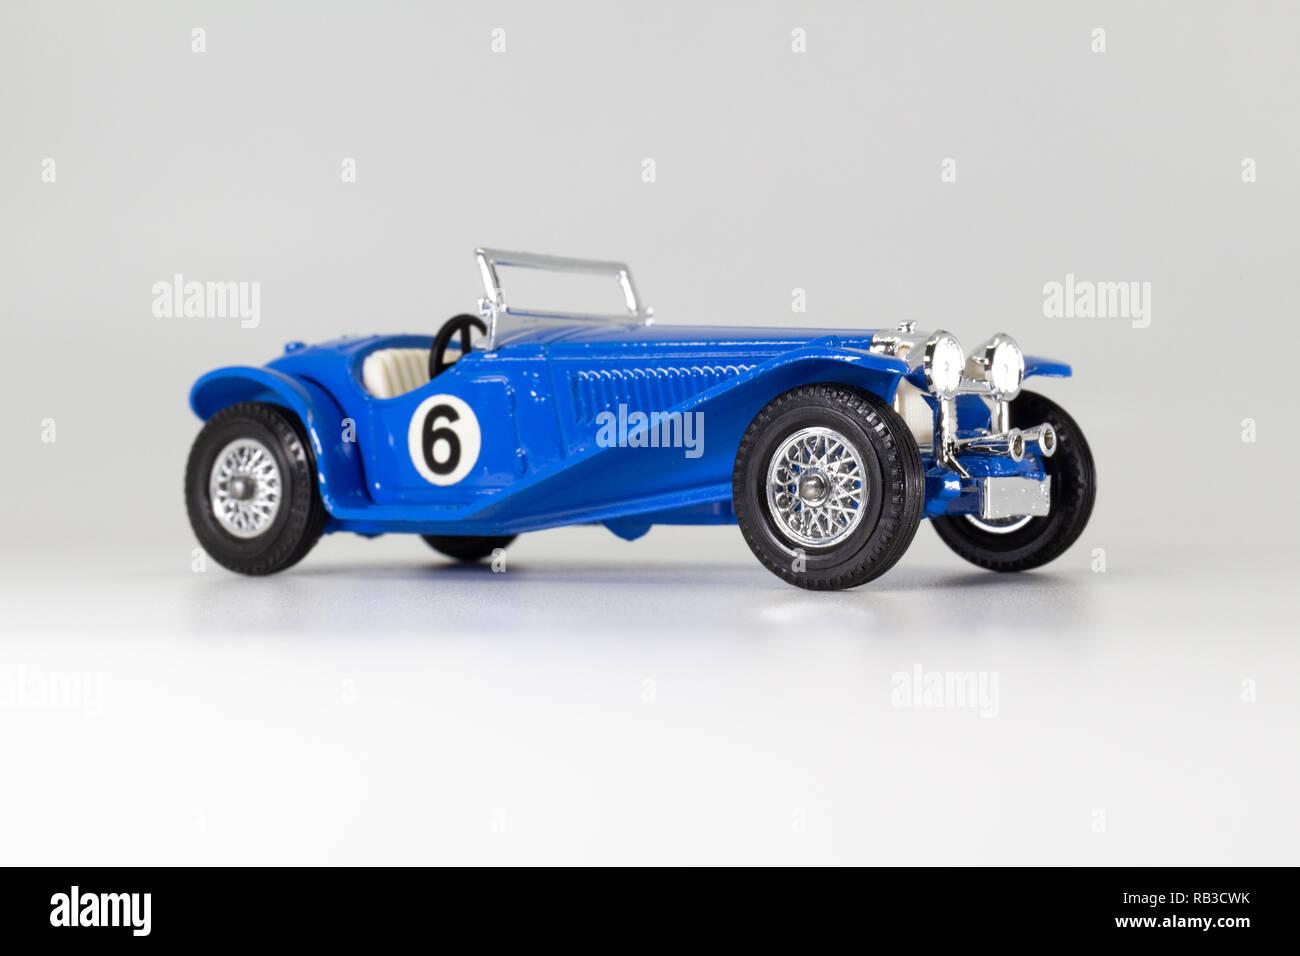 Modellbau Suiza 1938 Matchbox Made In England By Lesney Nr 9 Fahrzeuge Neueste Kollektion Von Hispano